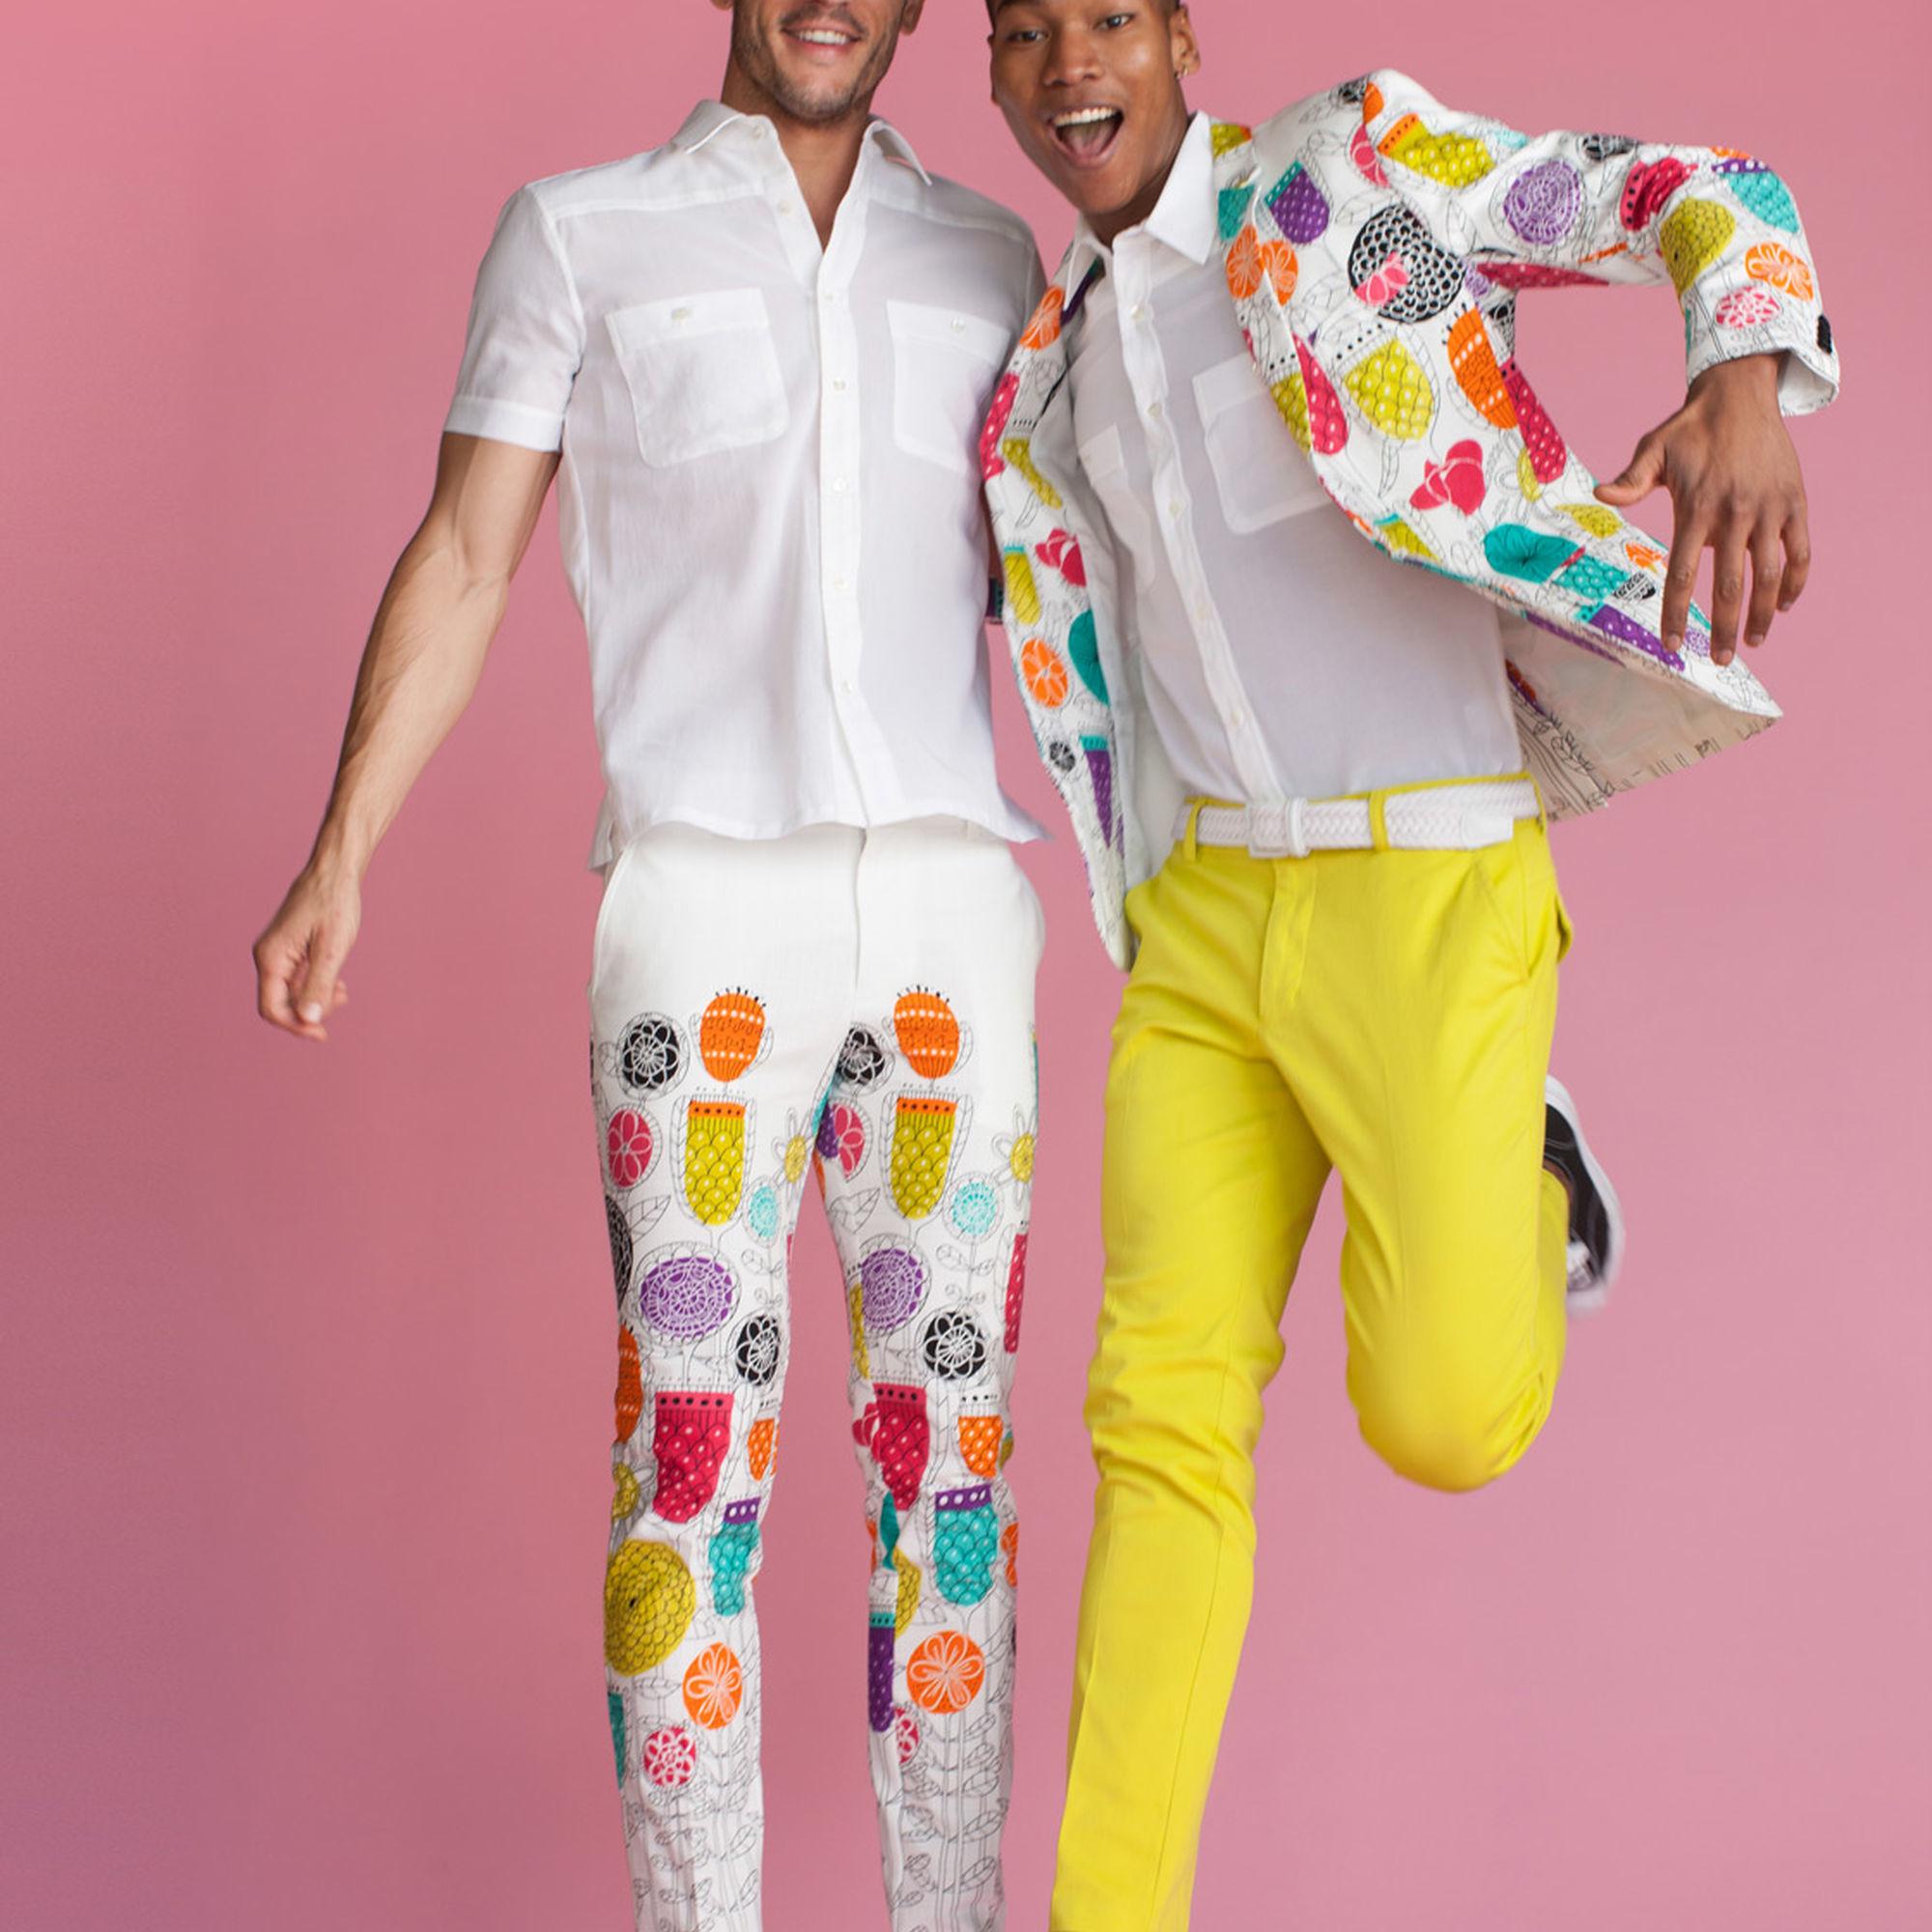 a45856e9c73 Lyst - Mr Turk Clyde Slim Trouser in White for Men